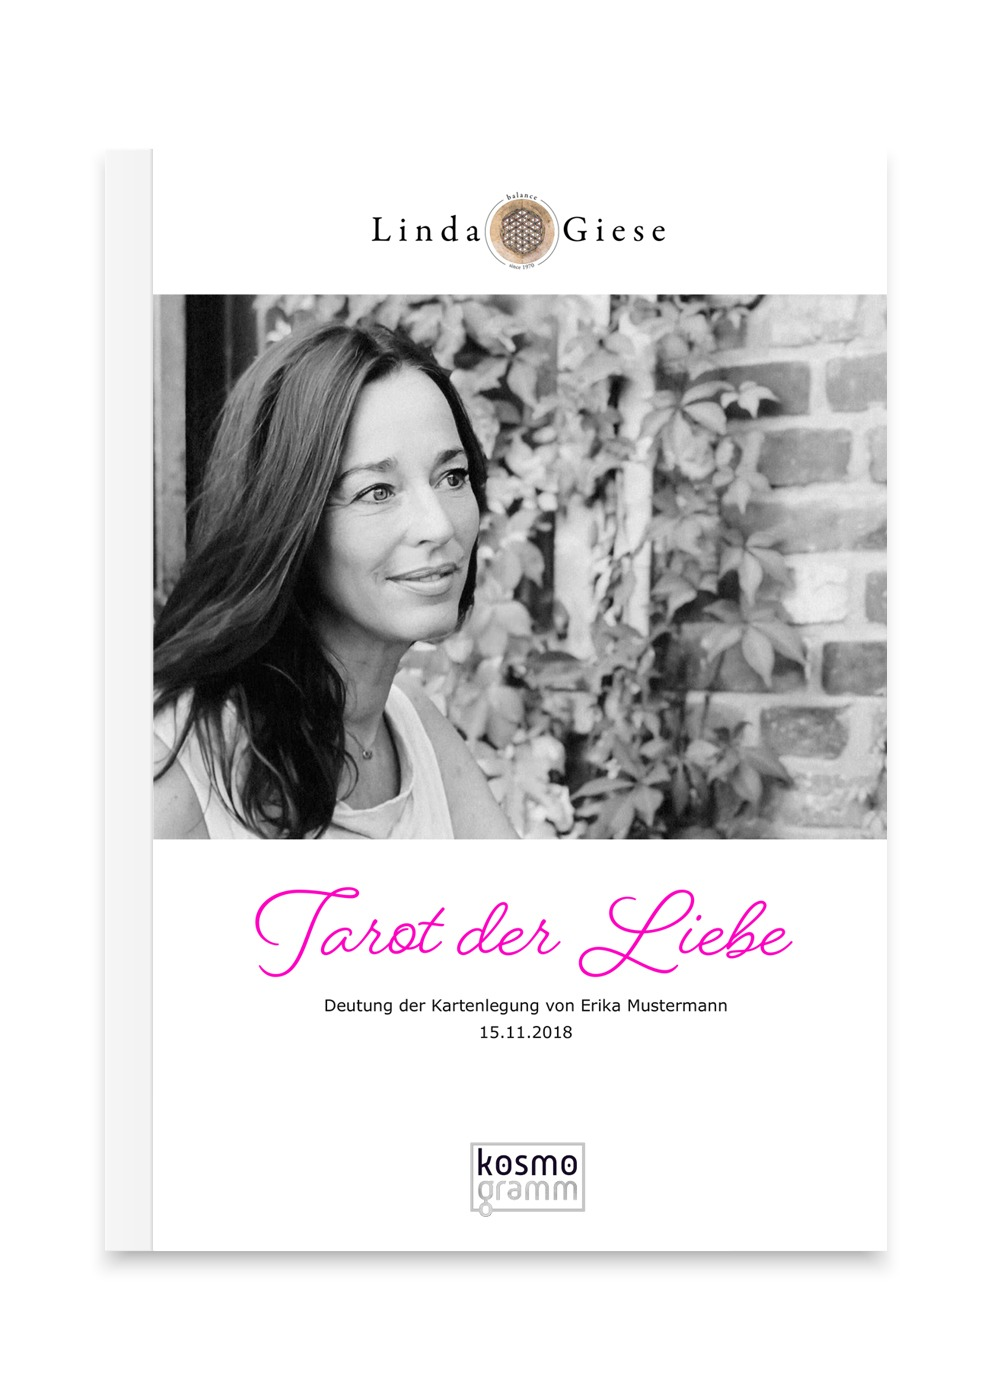 LIda Giese_Tarot der Liebe_Expertin für Spiritualität_Expertin für spirituelle Lebensberatung